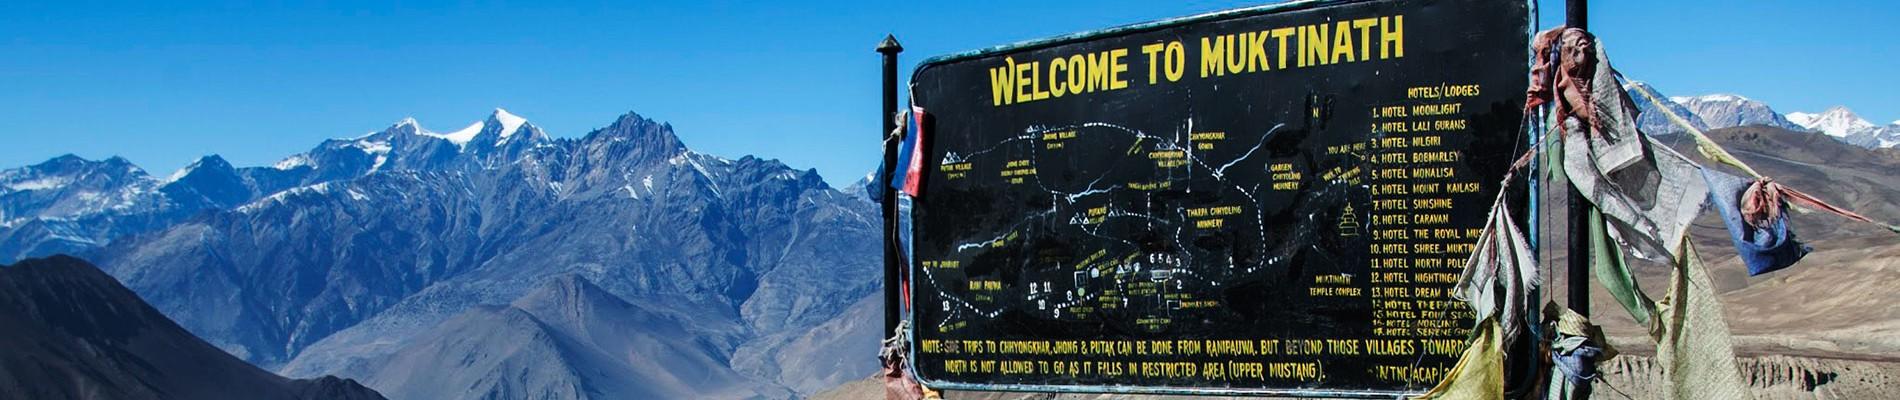 Nepal: 11d Jomsom Muktinath Trekking